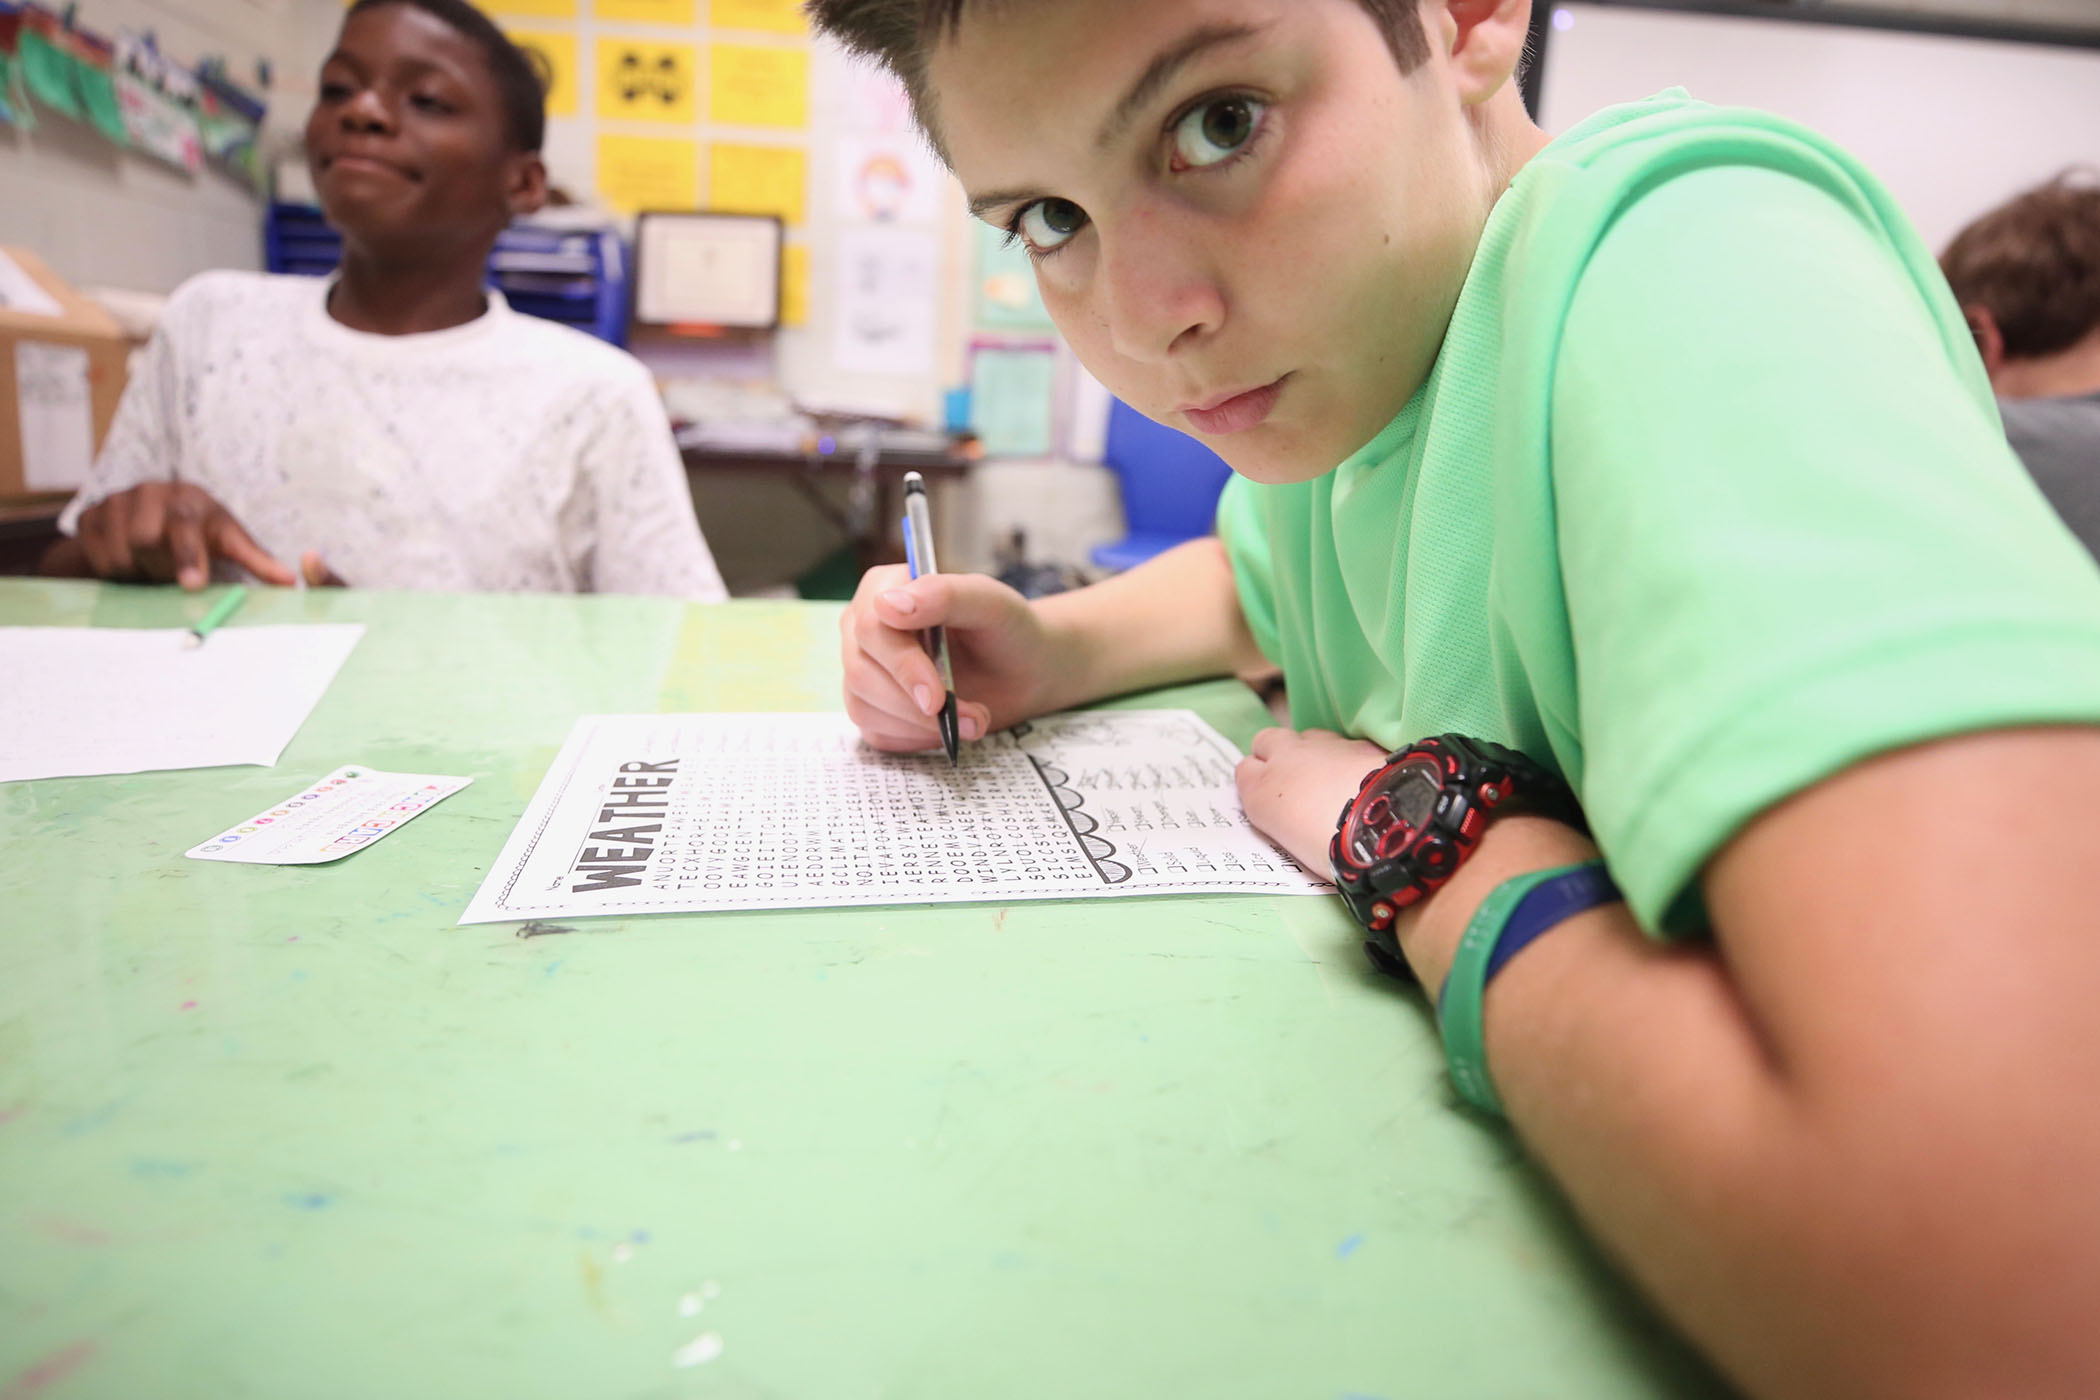 A student does bellringer work before art class at QJH.